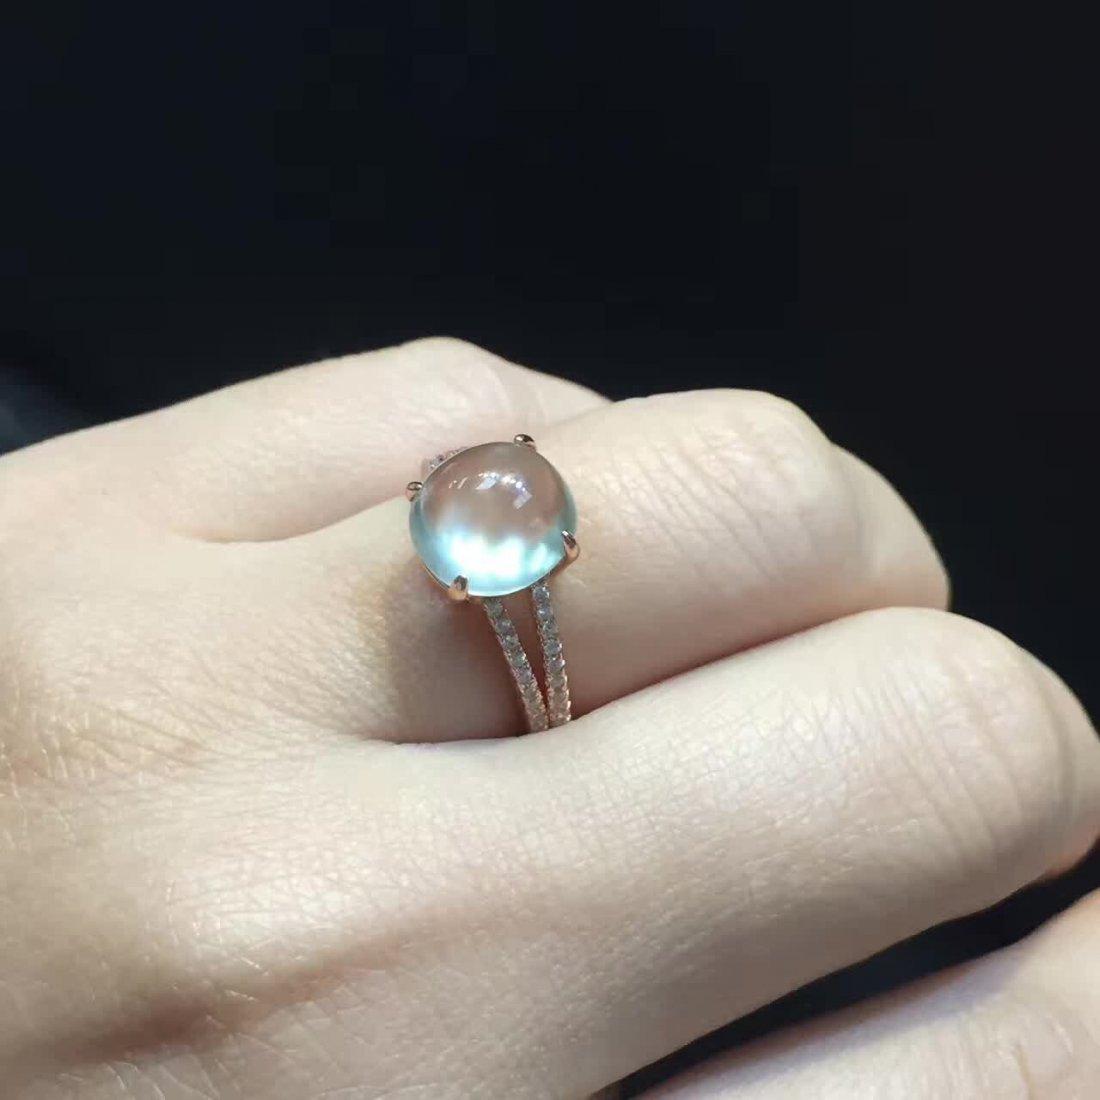 18k gold inlaid ice species emerald jade pendant ring - 6